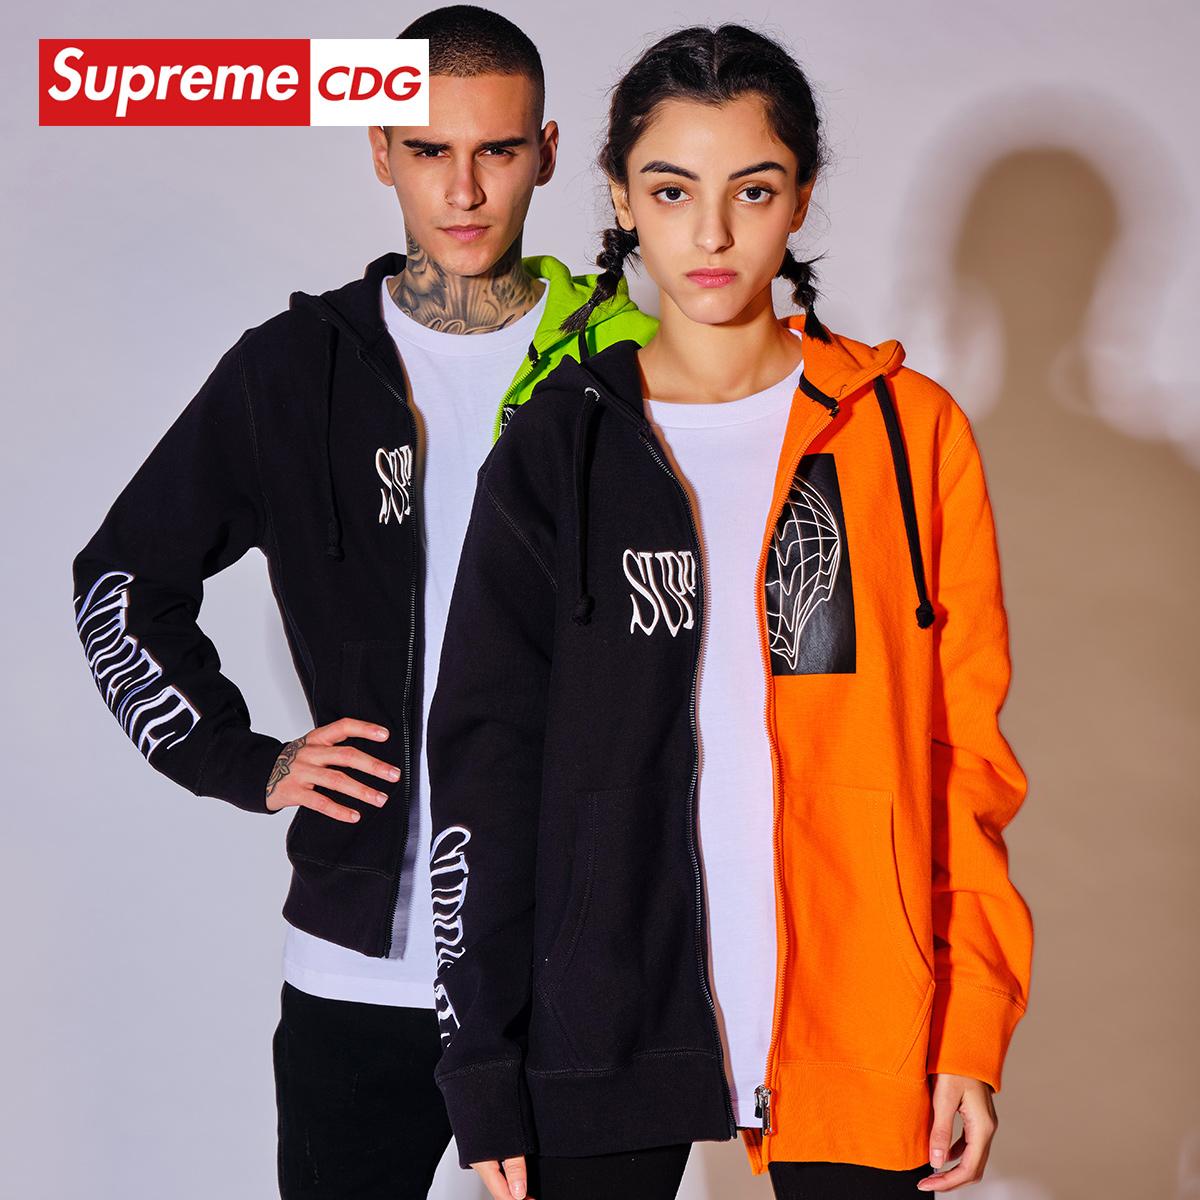 Supreme CDG 2020年春季新品男女同款连帽开衫卫衣休闲运动上衣